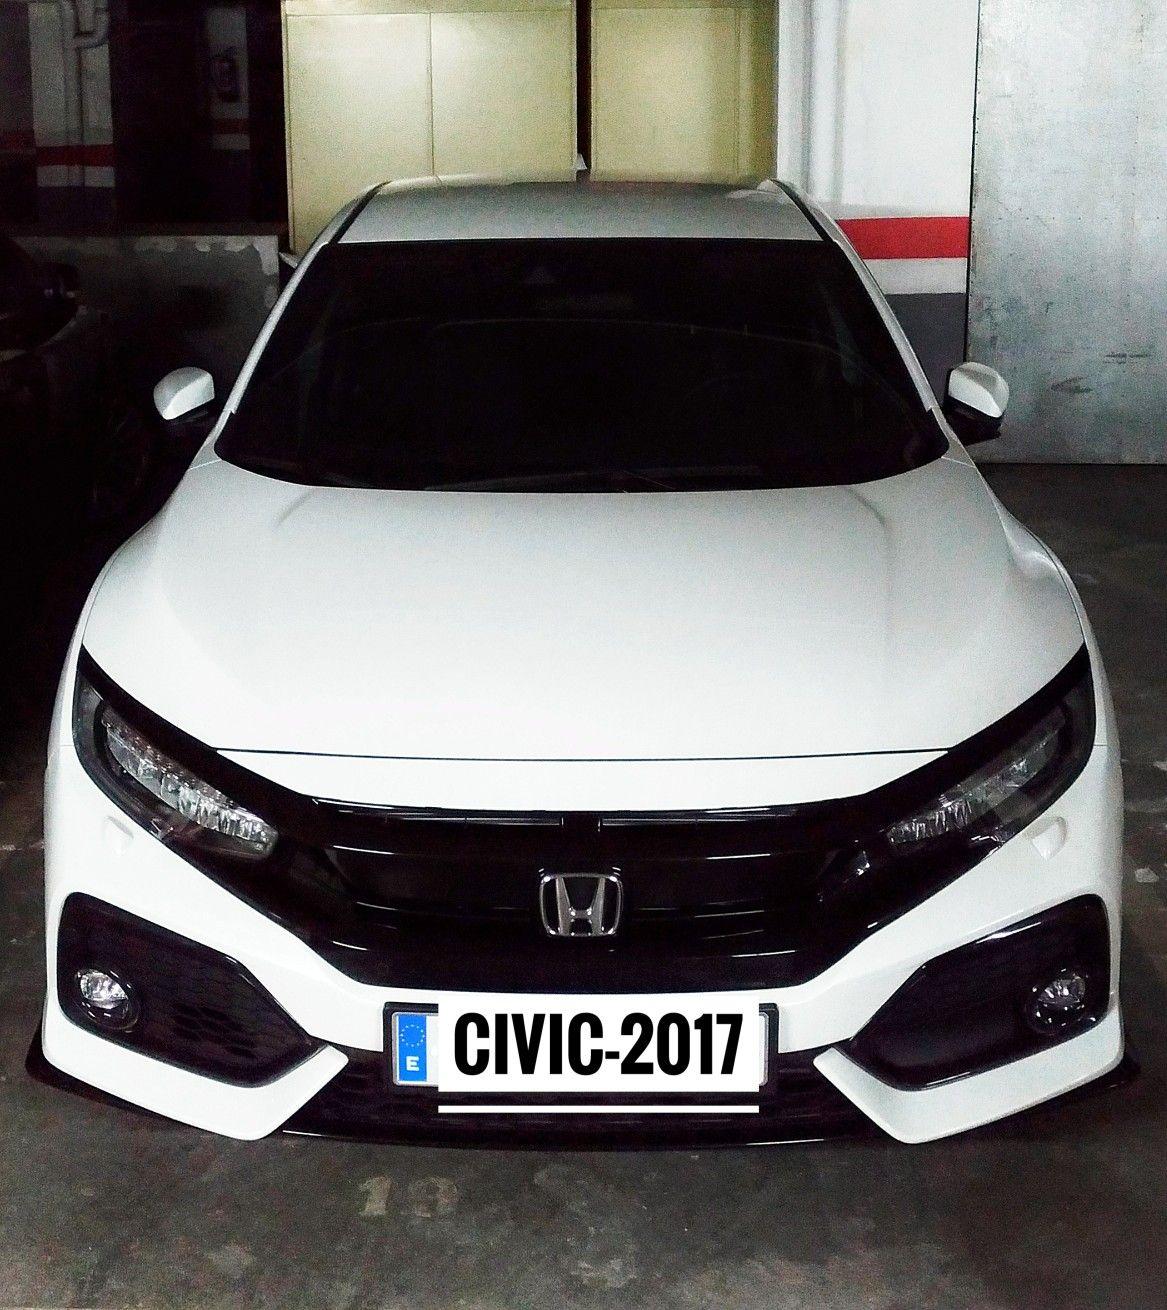 Honda civic sport 2017 1.5 turbo white Honda civic 2017